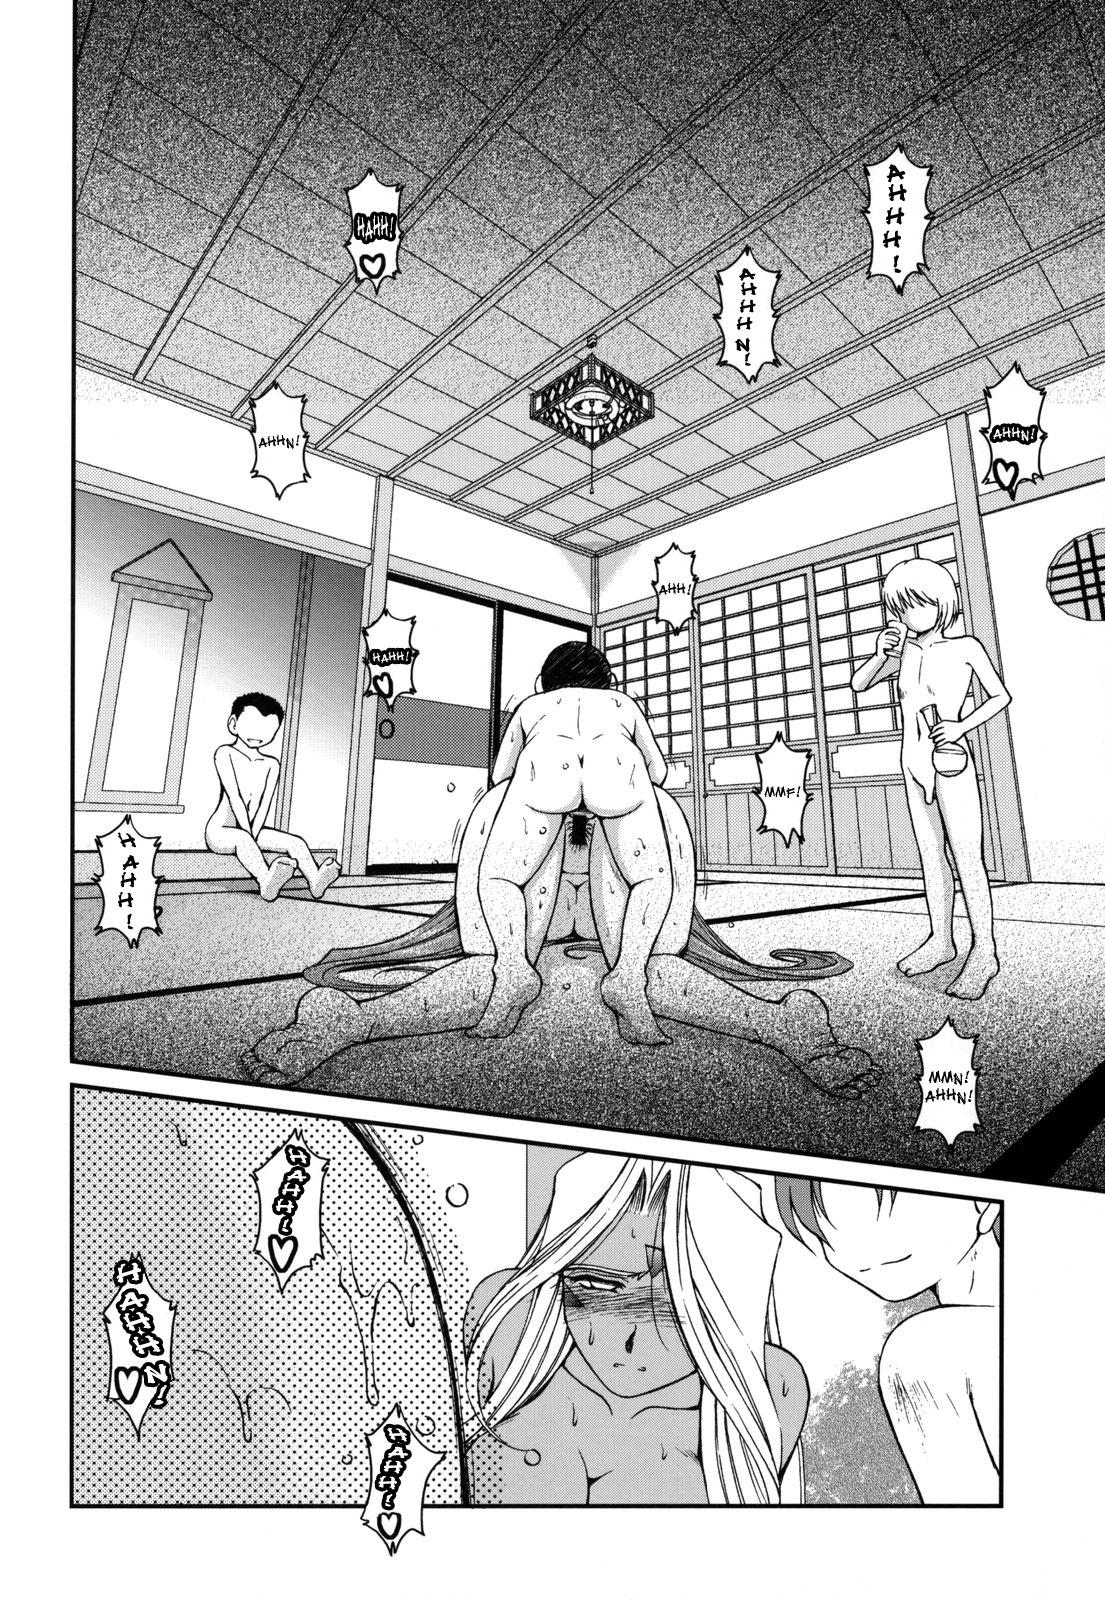 (C63) [CIRCLE OUTERWORLD (Chiba Shuusaku)] Midgard  (Ah! My Goddess) complete [eng] 174